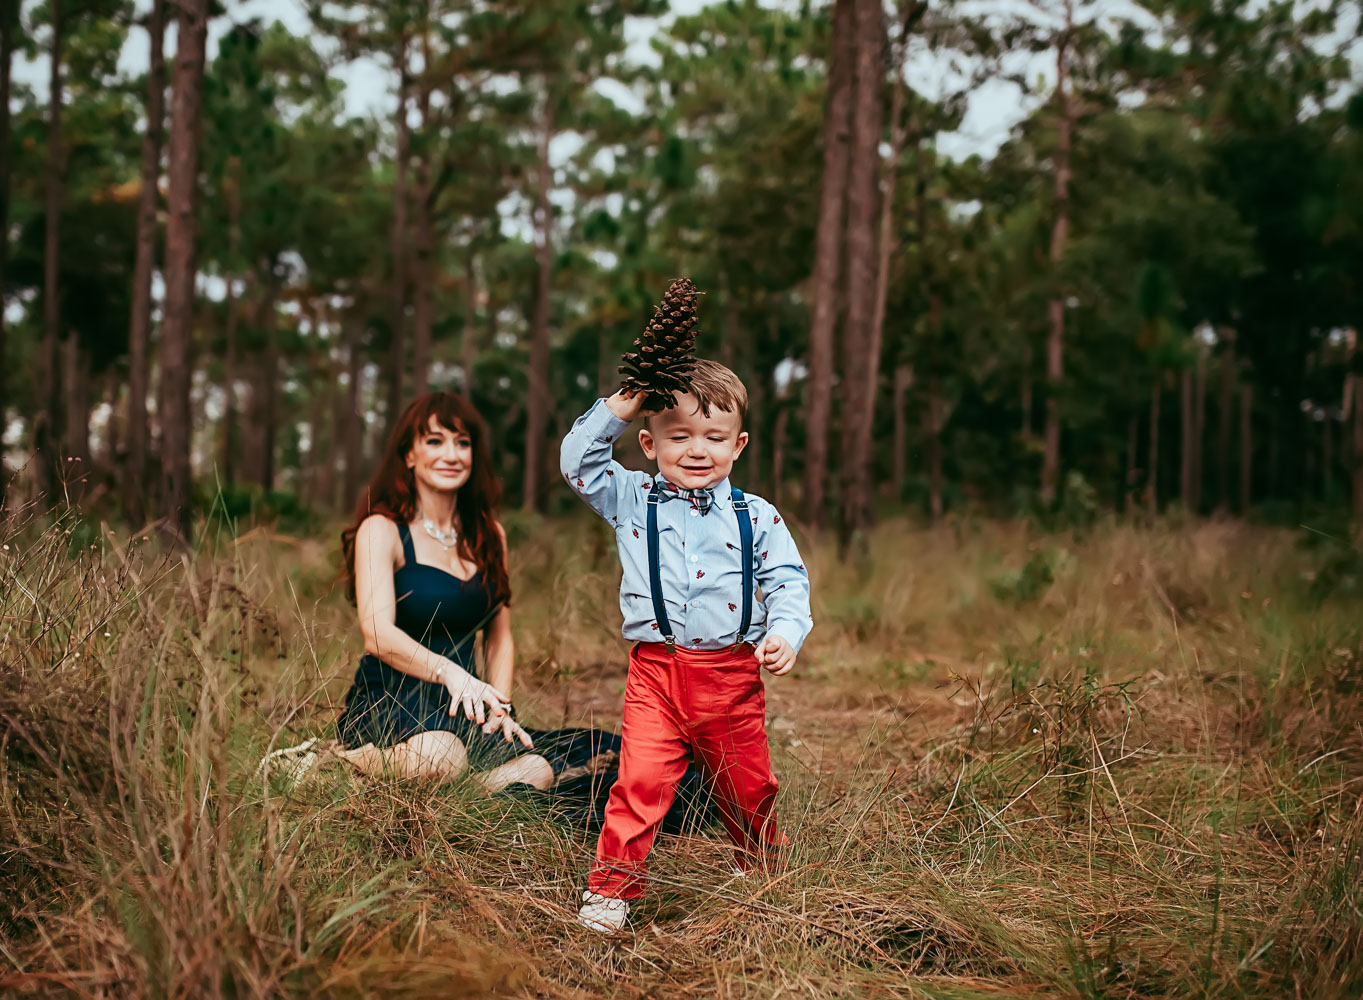 Apopka_Wekiva_Springs_State_Park_Florida_Costa_Erika_Reiner_Photography (25 of 42).jpg